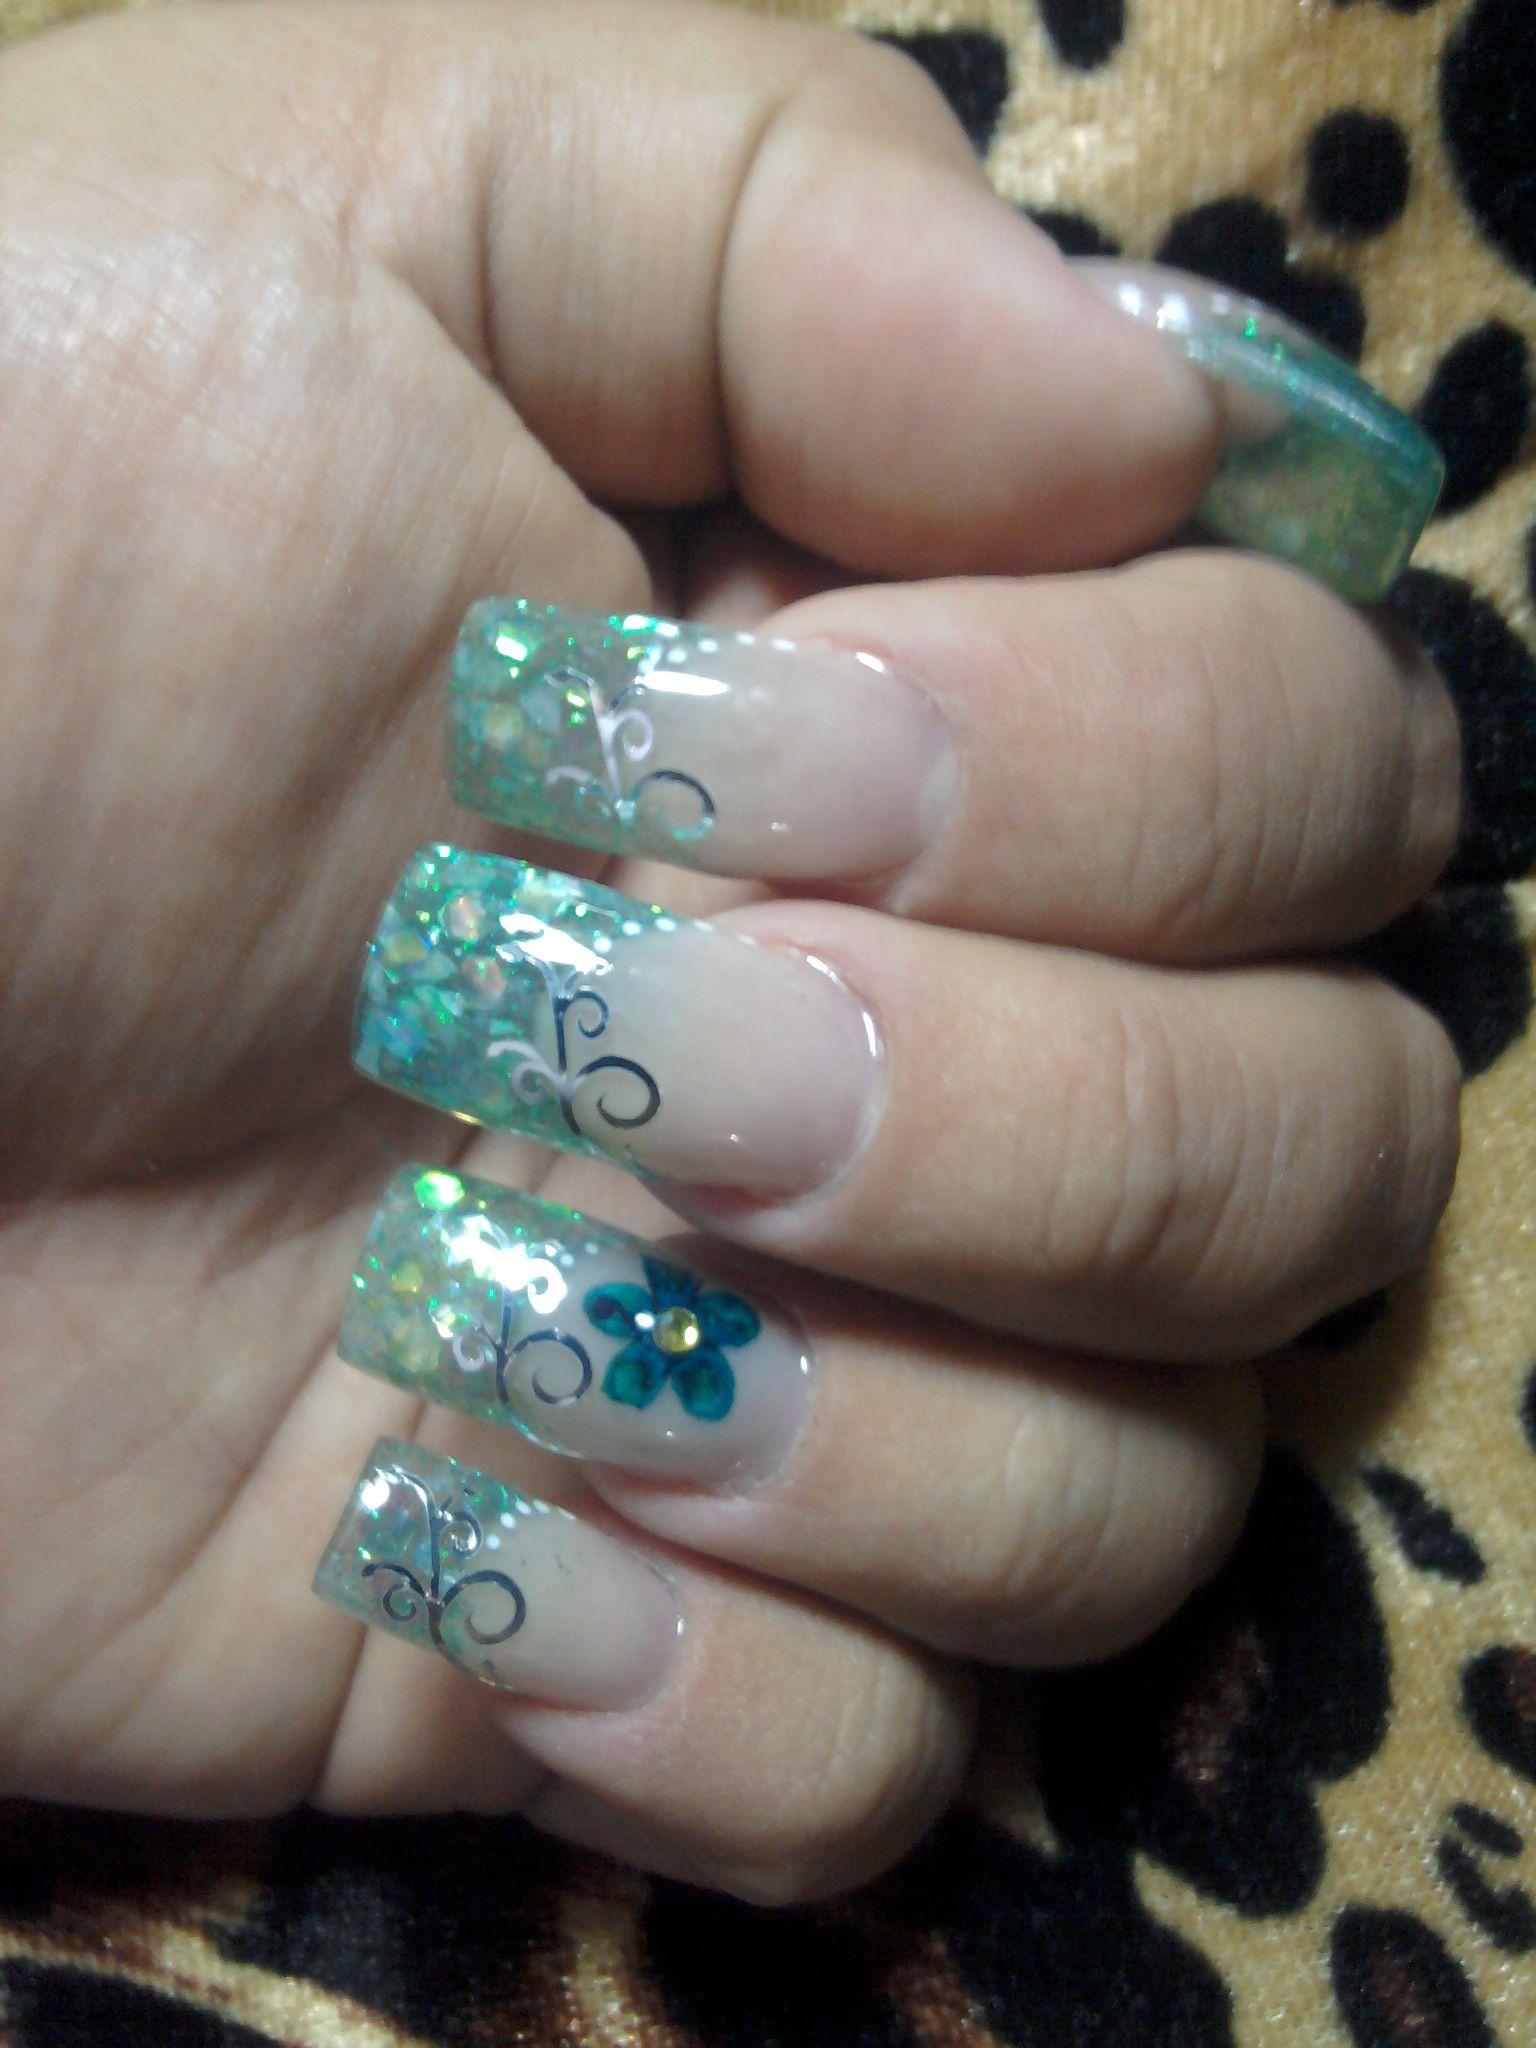 Gota de arte decoraci n de u as nail art eyes nail art - Unas azules decoradas ...